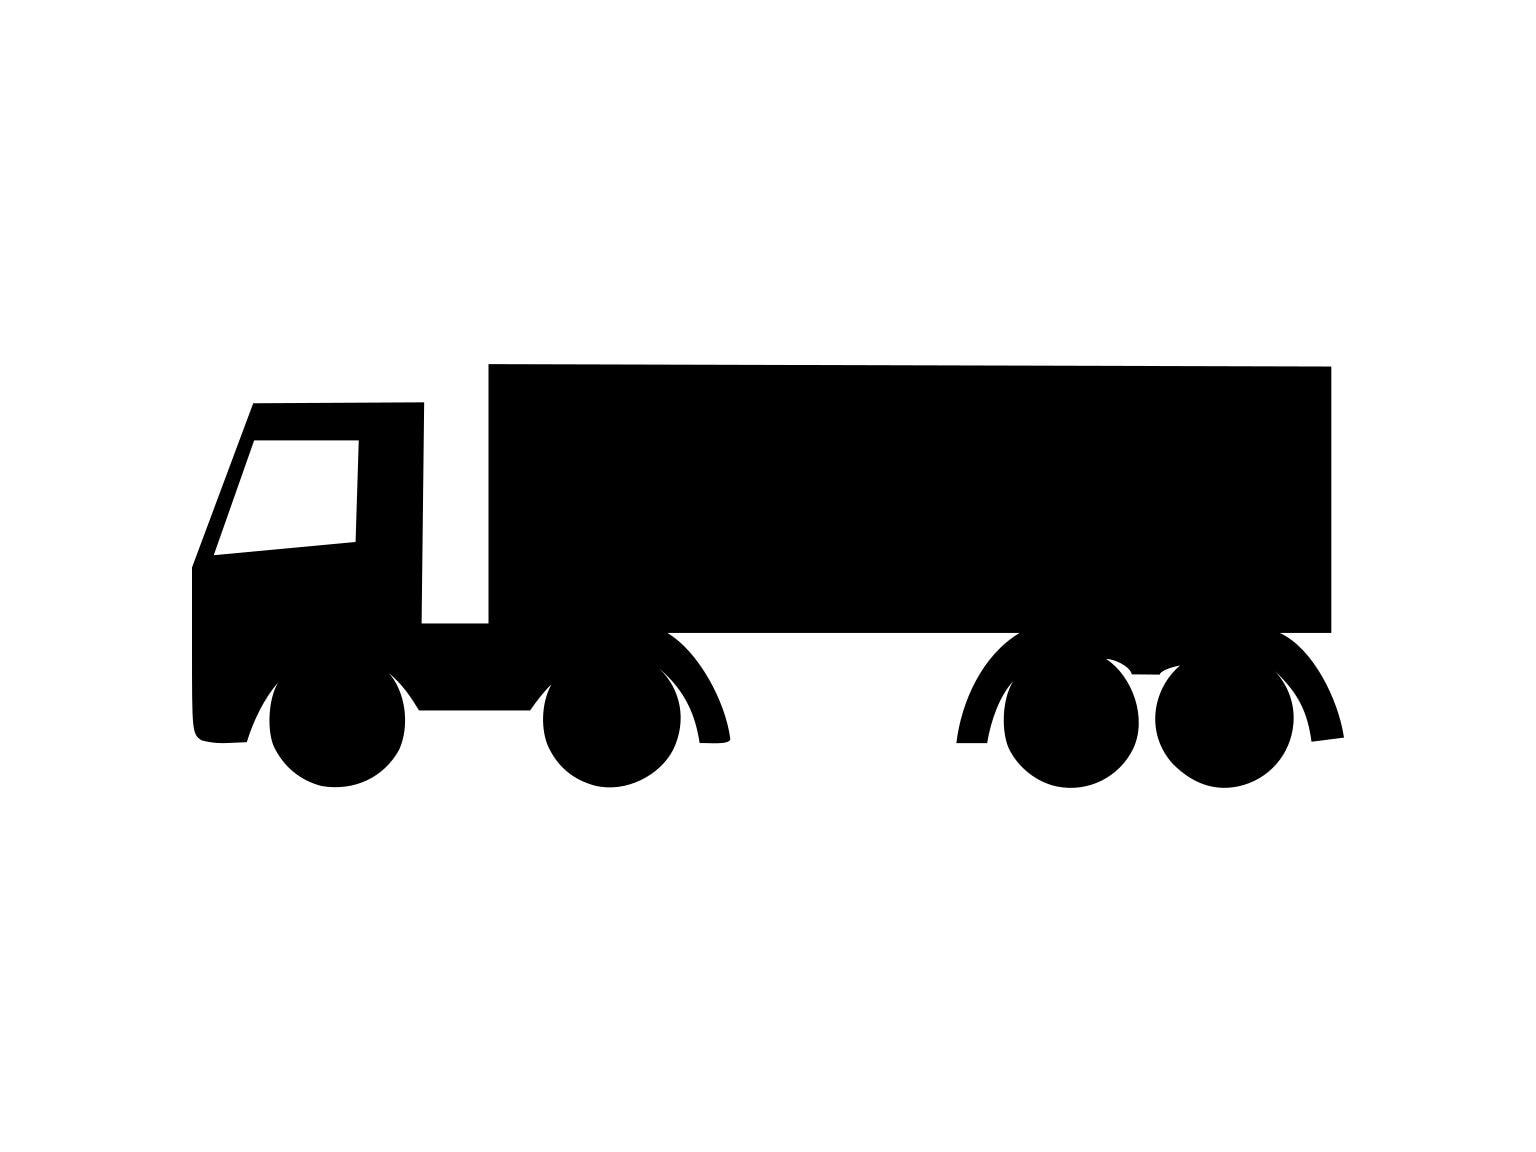 Truck Svg, Semi Truck Svg, Truck Vector, Truck Download, Truck Svg File,  Truck Illustration, Cutting Svg, Truck Clipart, Truck Cut File